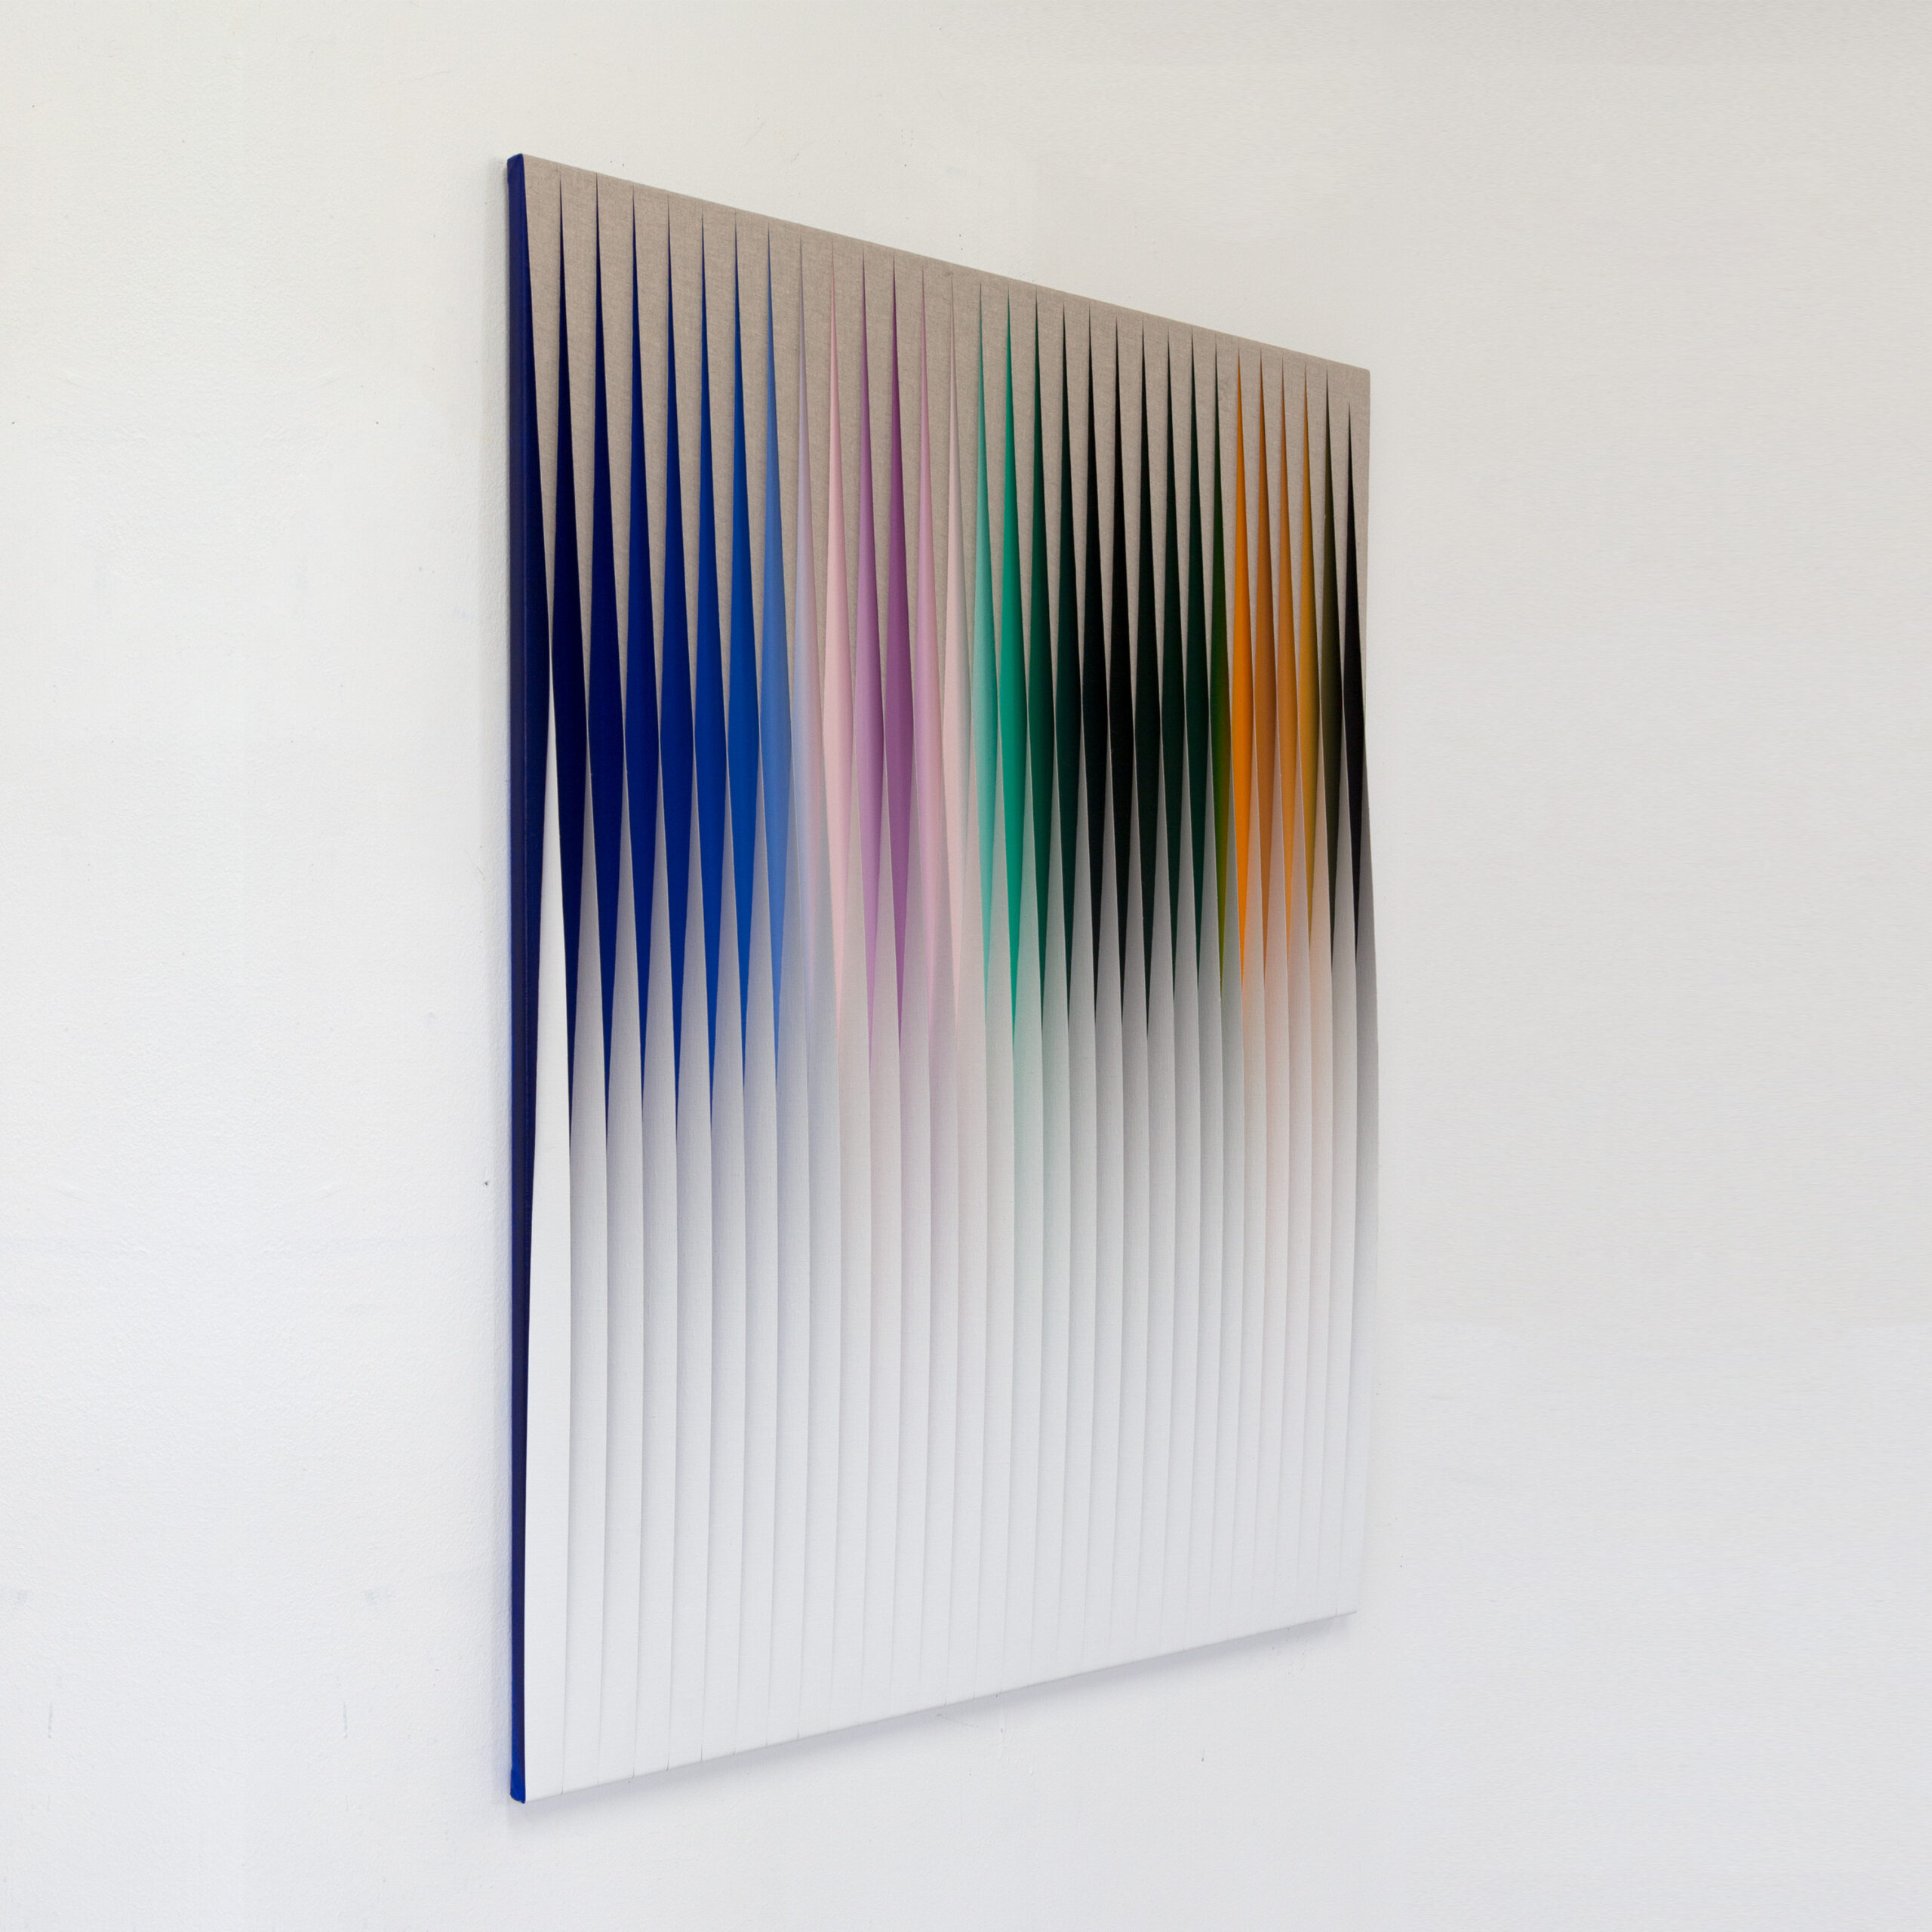 5021049-115×90-oil-raw-canvas-2021-23.000-side2